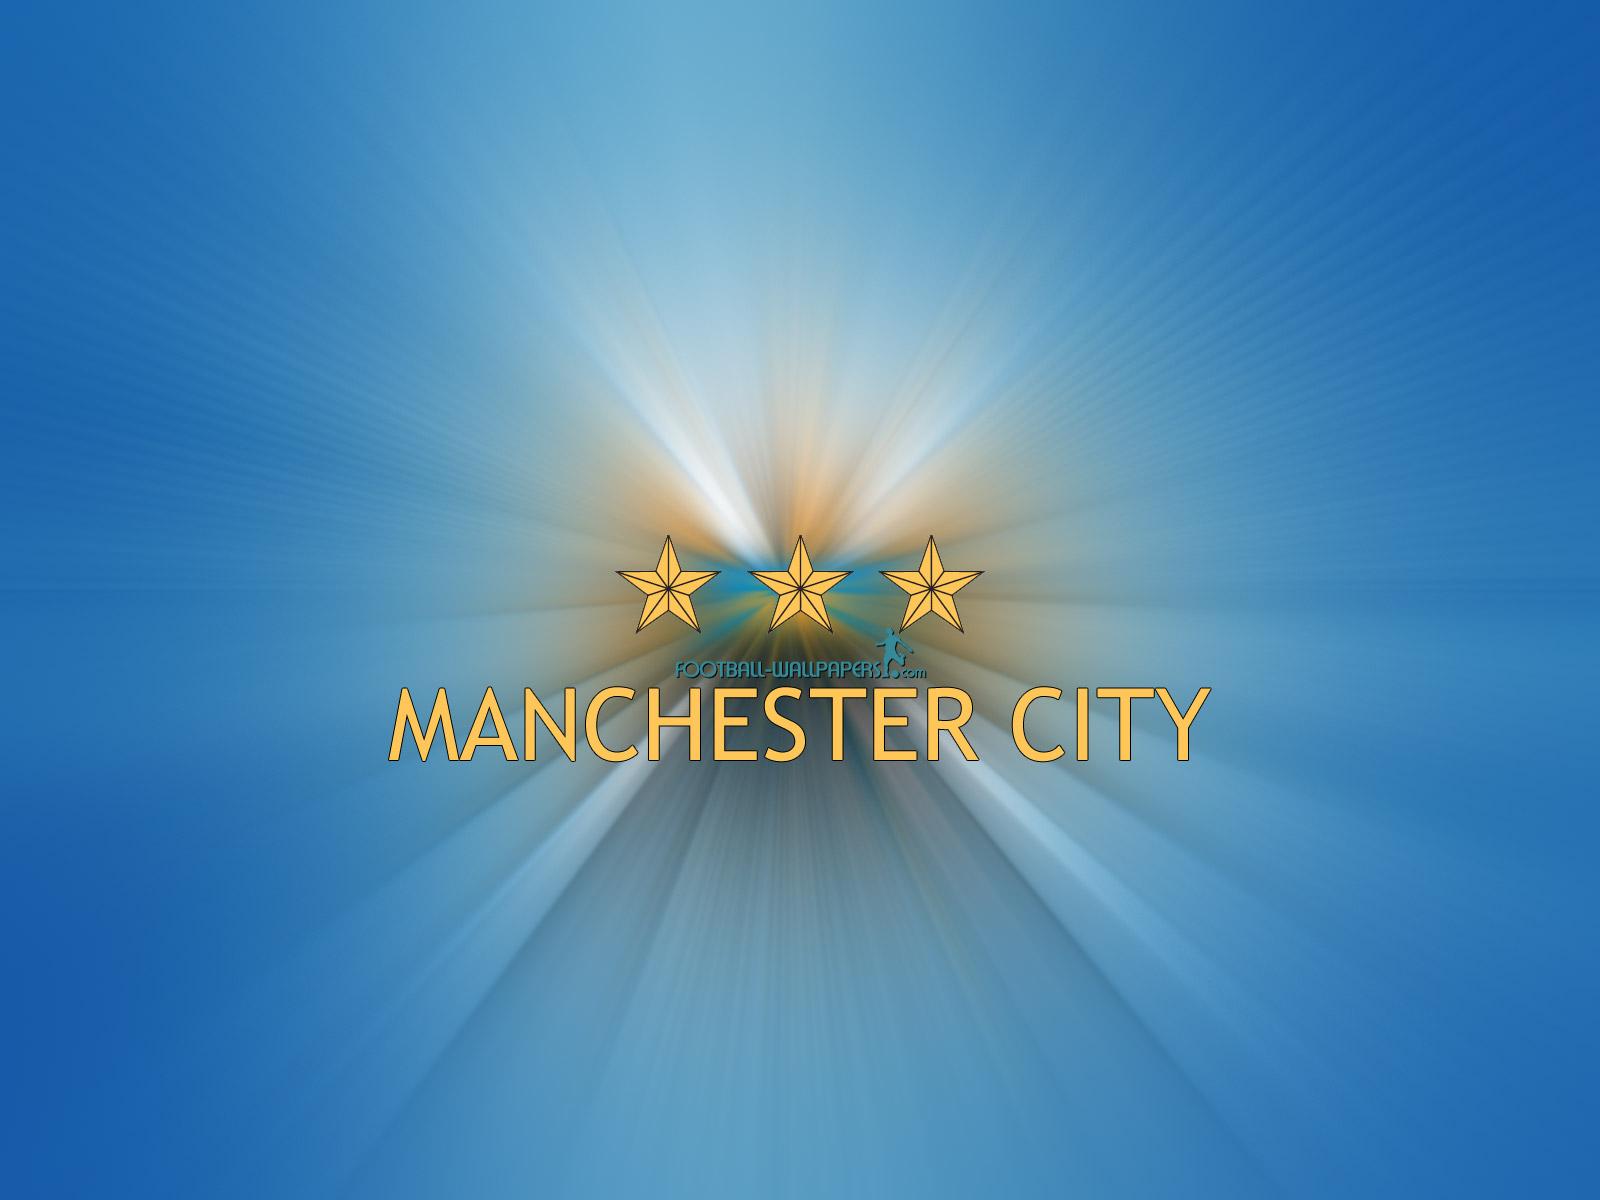 Manchester City Wallpaper: Manchester City FC Wallpapers